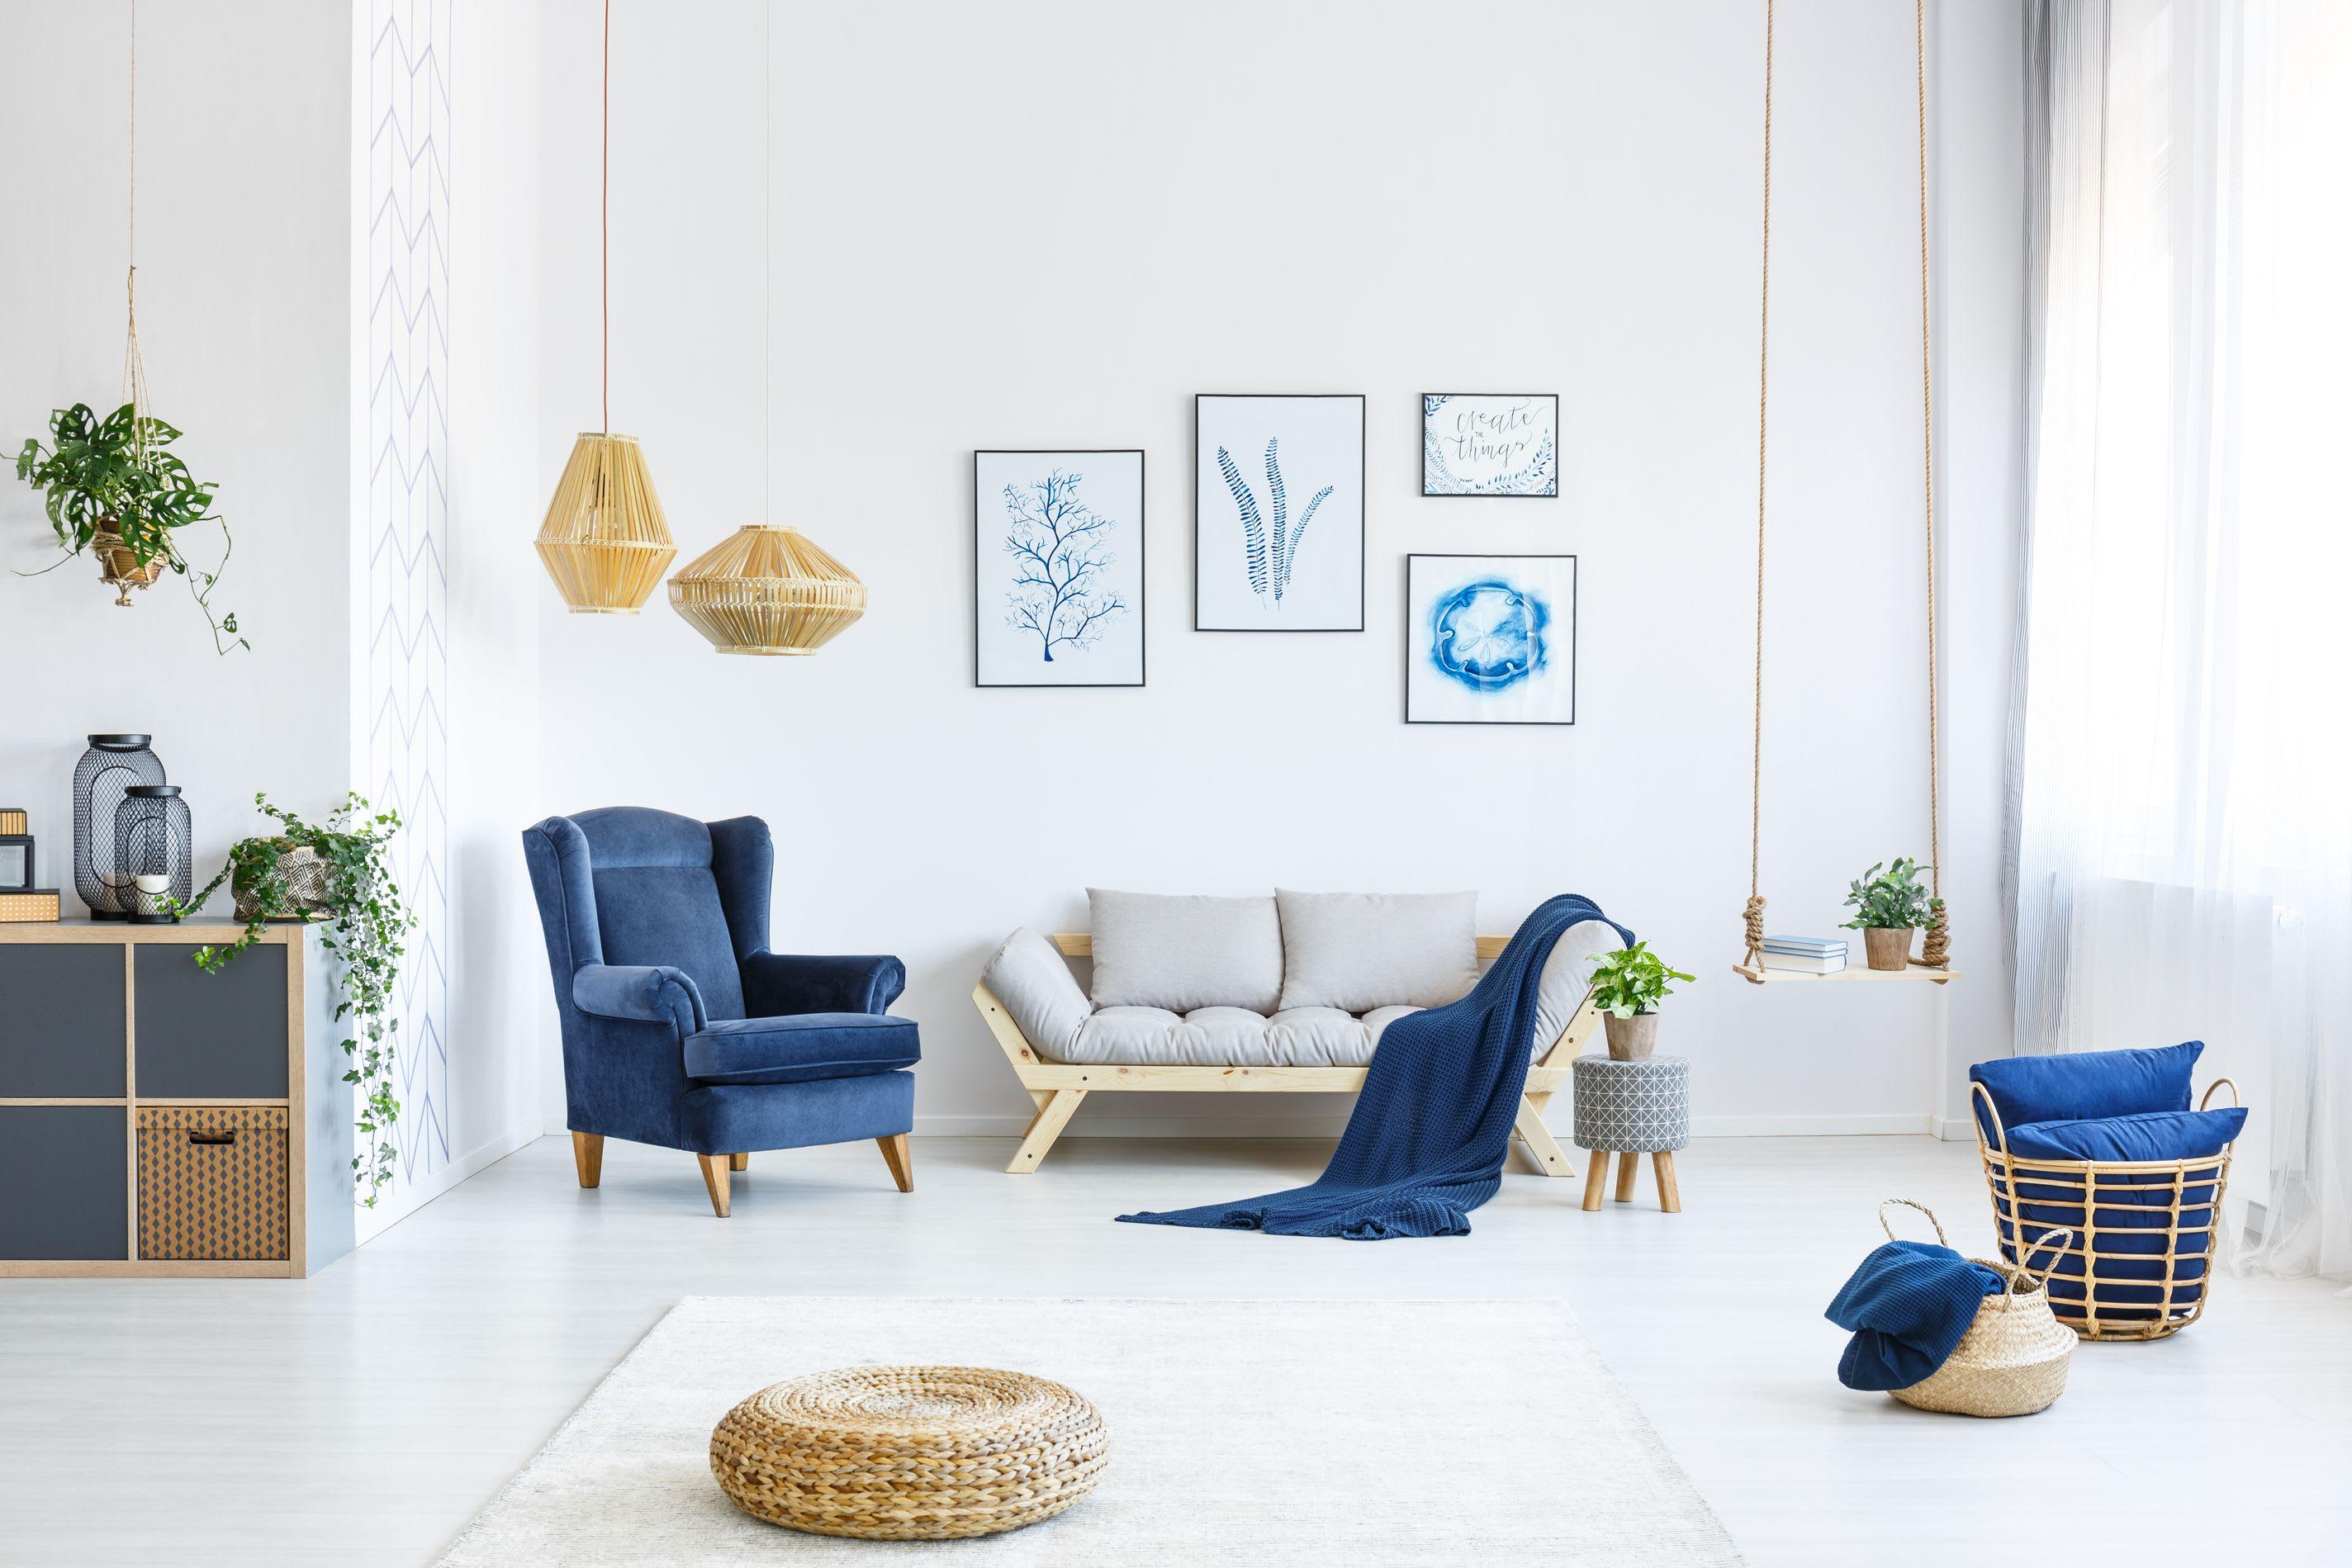 Do Minimalist Interior Design For Your Studio Apartment Home Office Cafe By Kafilsaddam